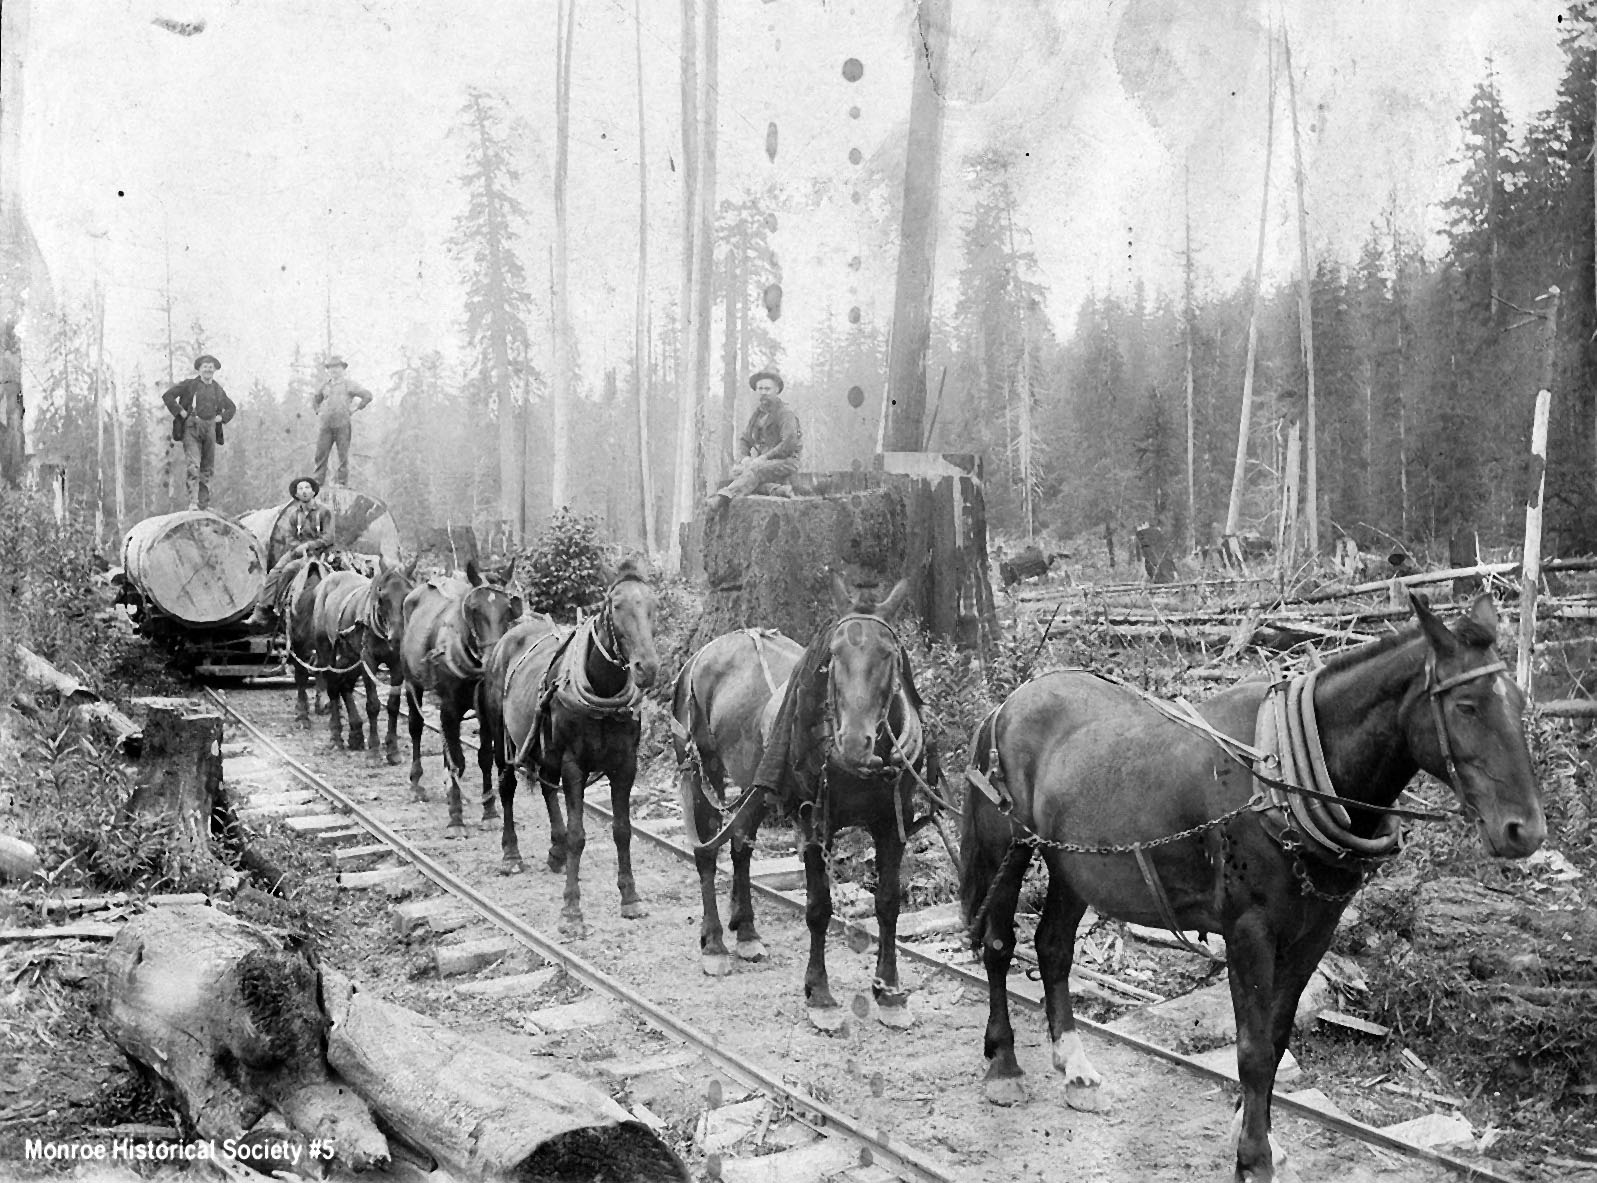 0005 – Six-horse team hauling logs on railroad tracks